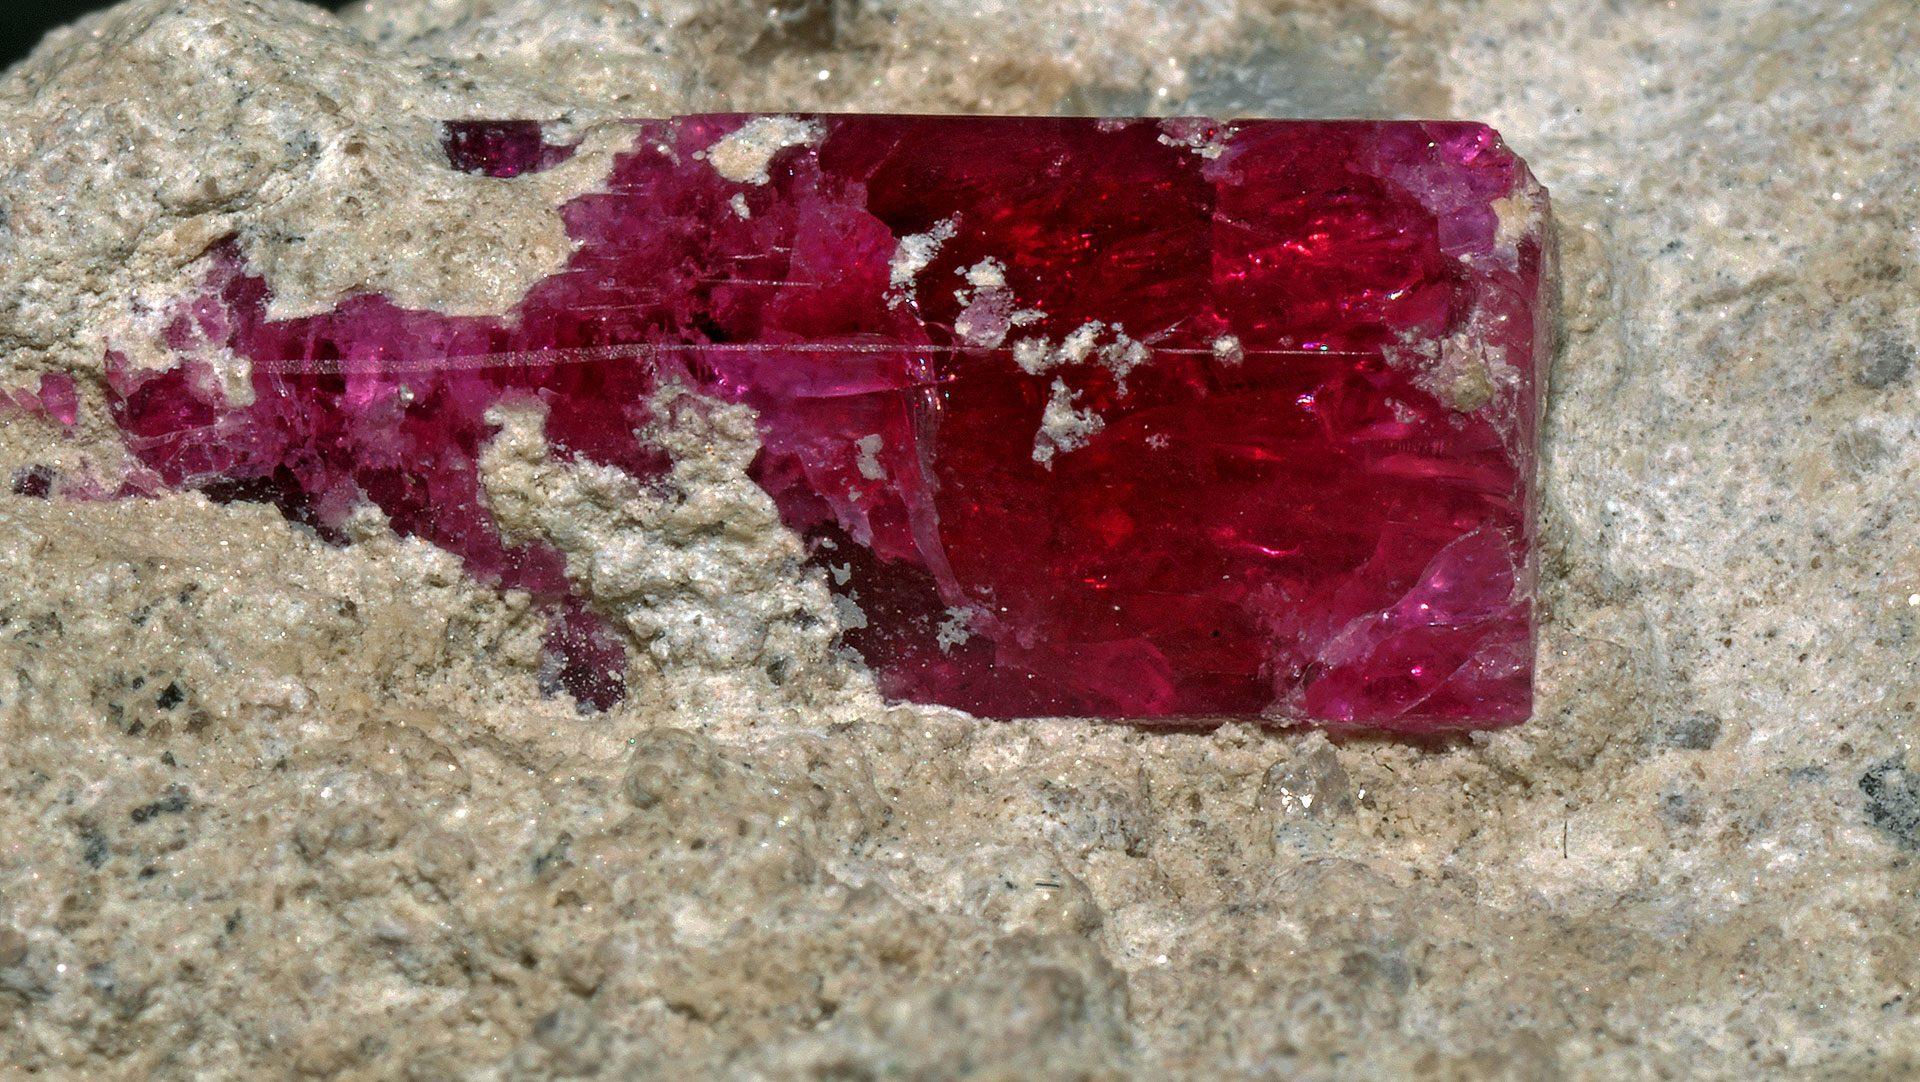 Terminated Bixbite Crystal Specimen - Red Beryl